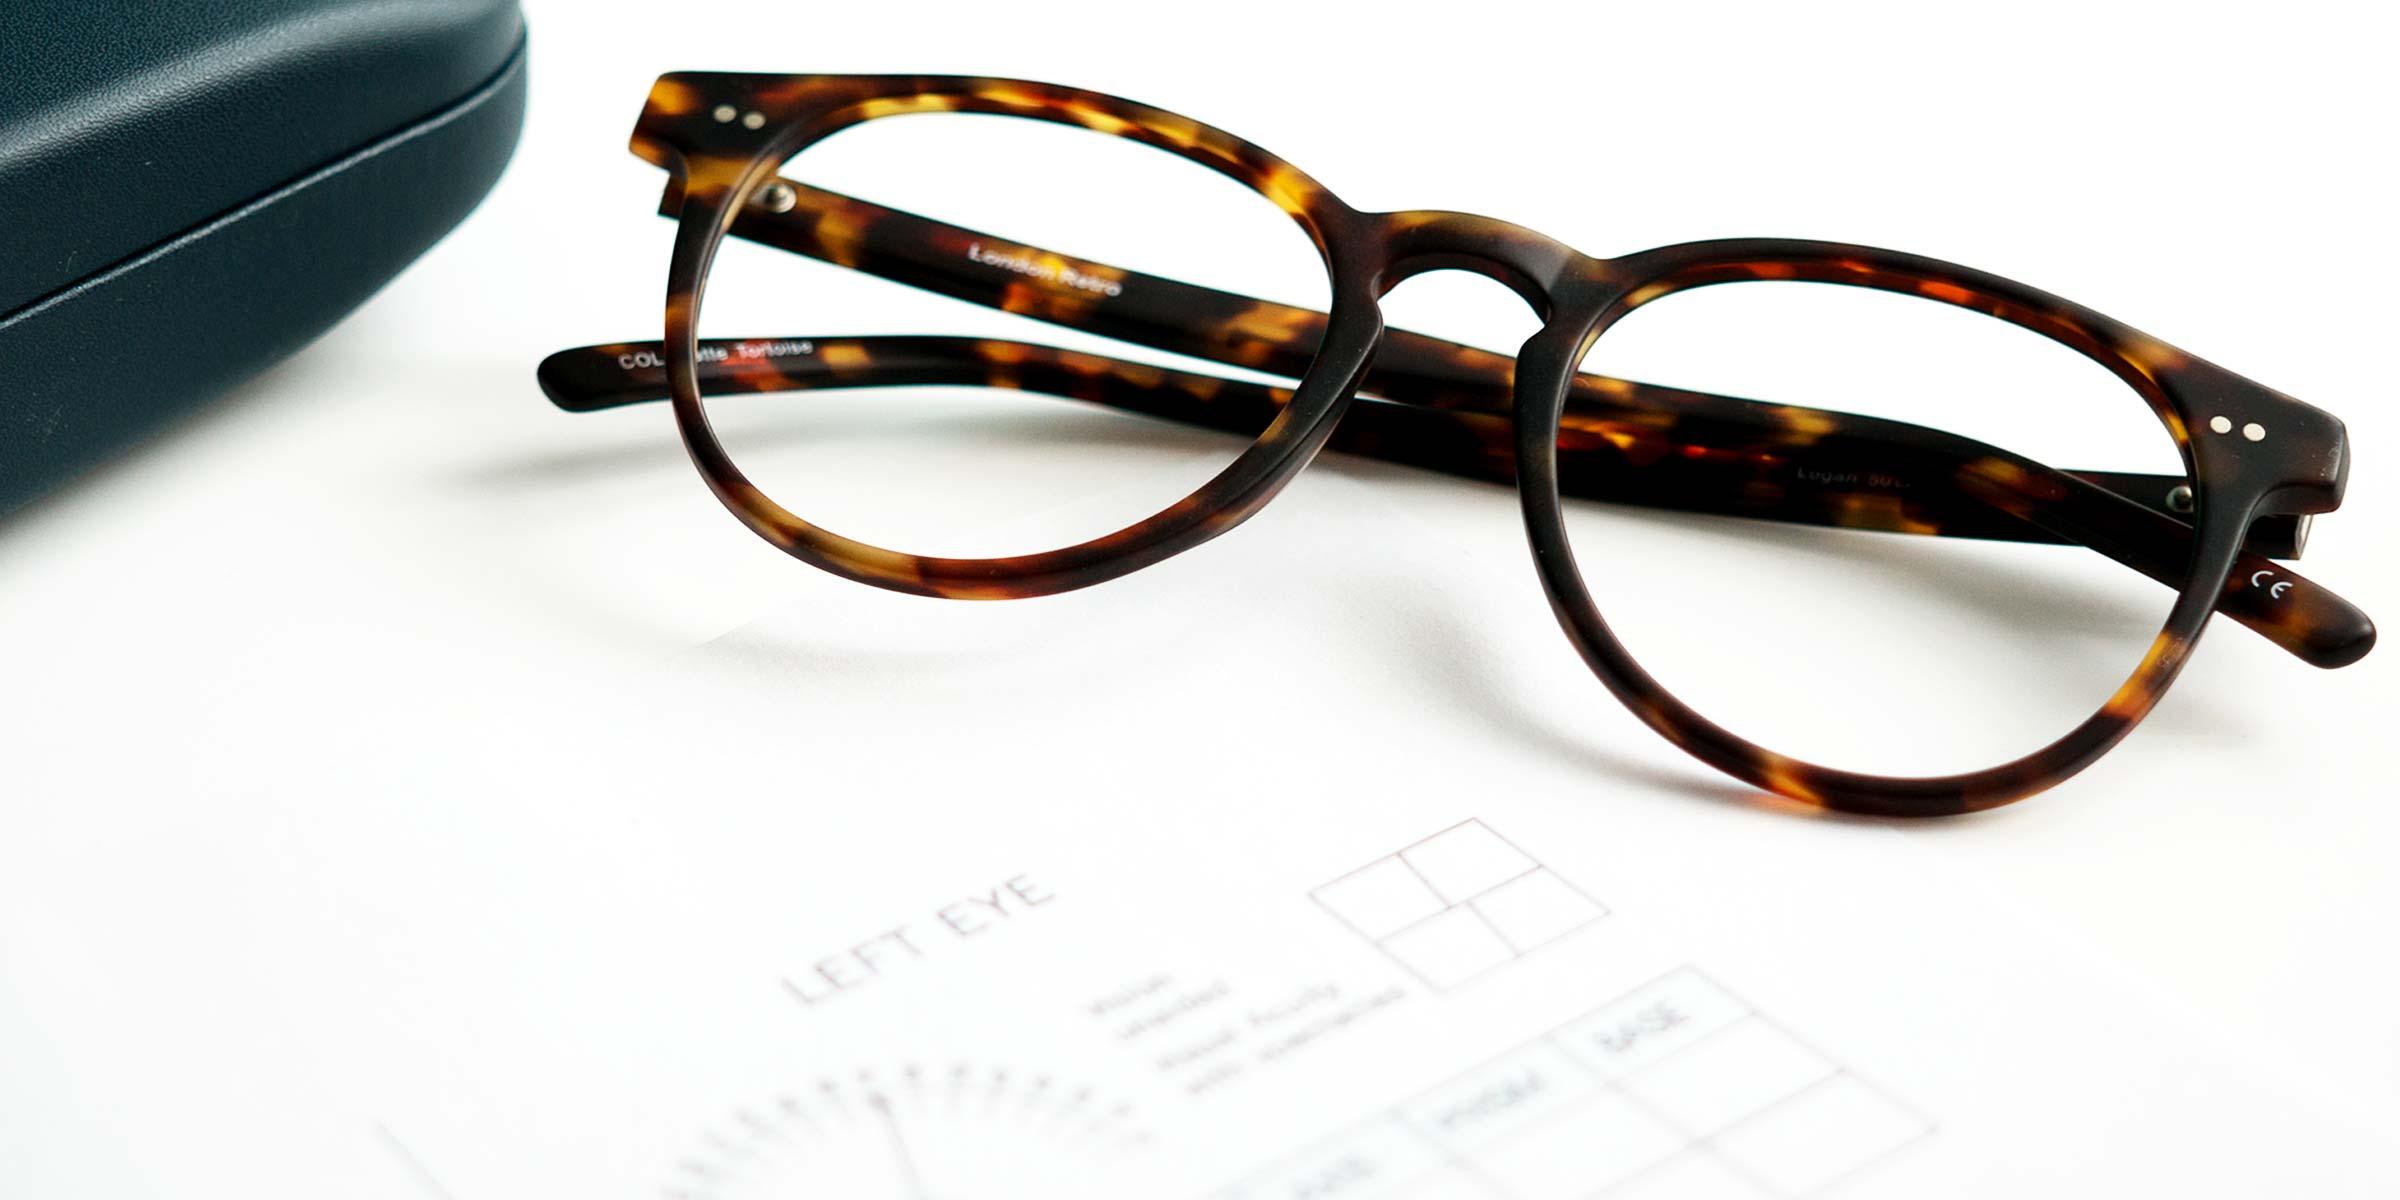 A tortoiseshell glasses frame